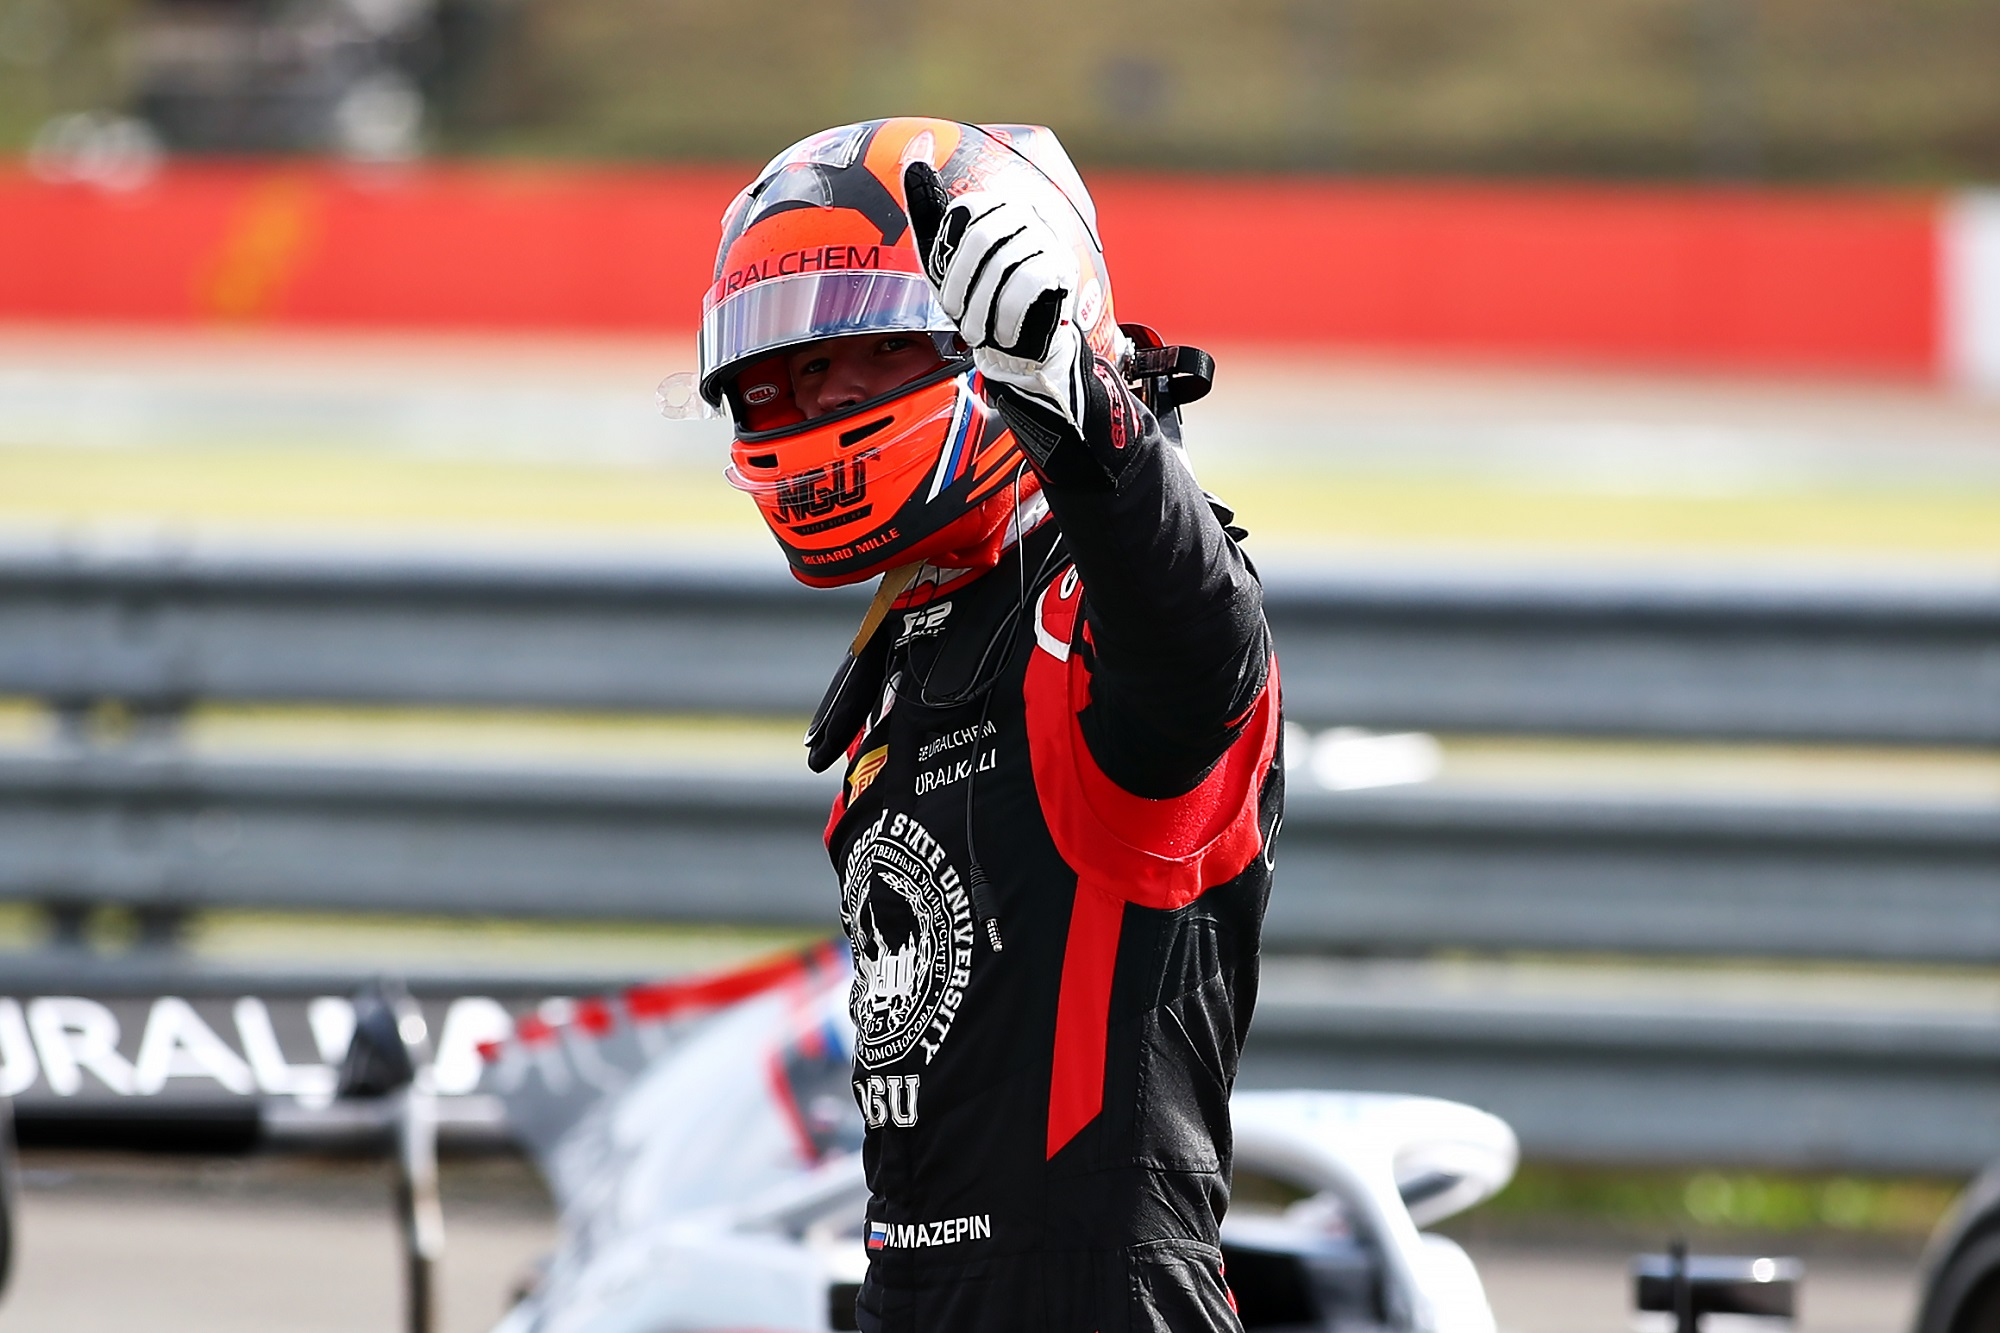 001_nikita_mazepin_hitech_grand_prix_c_formula_motorsport_limited.JPG